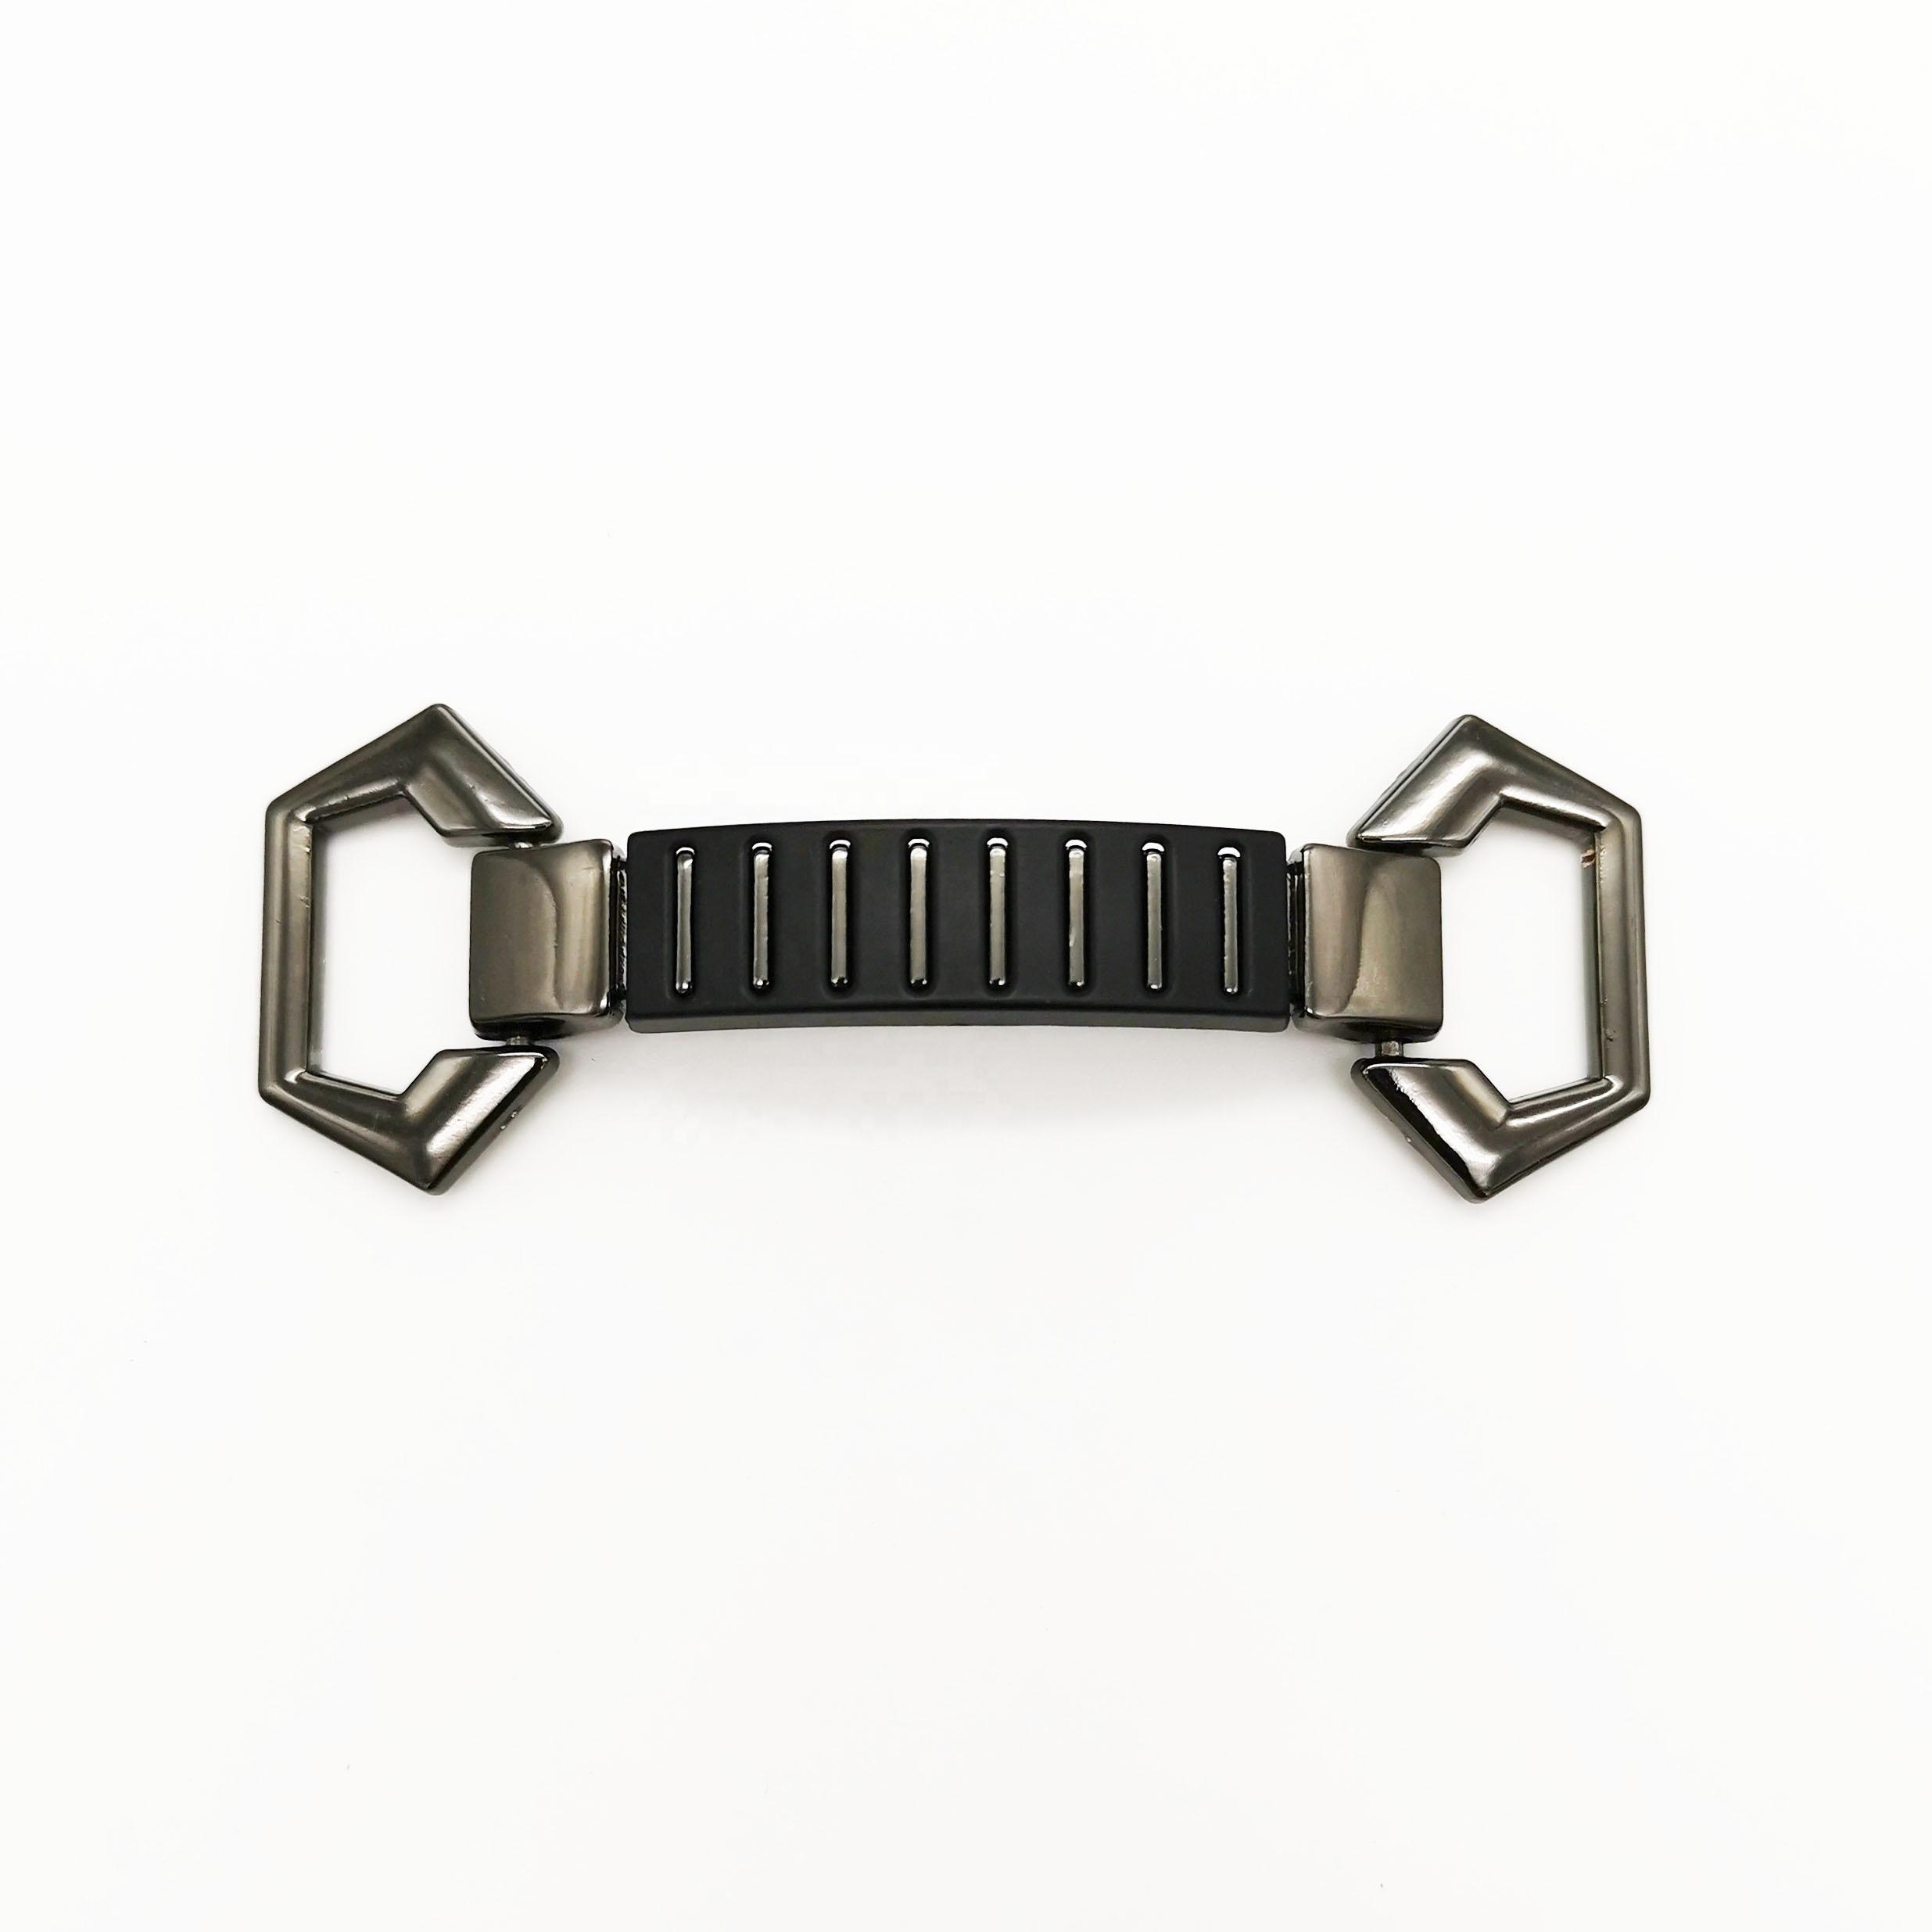 shoes chain decoration  accessories components